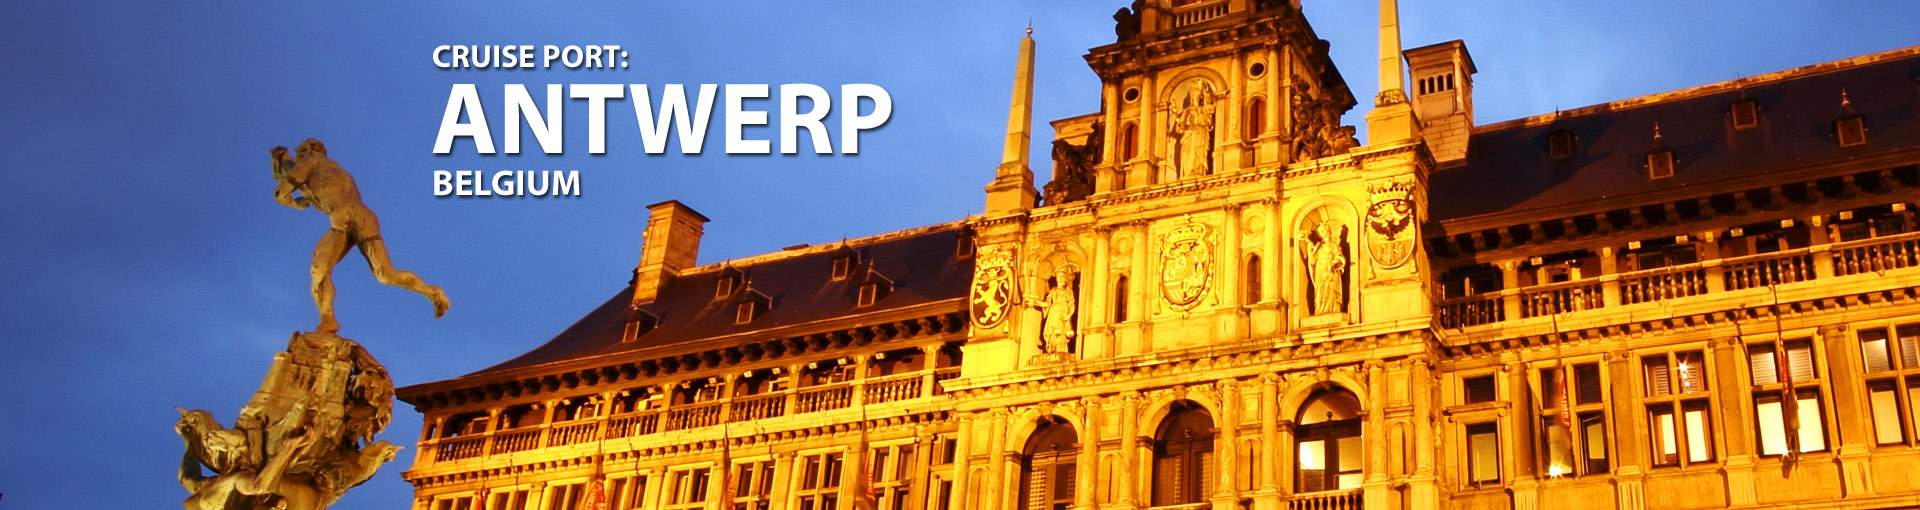 Cruises from Antwerp, Belgium